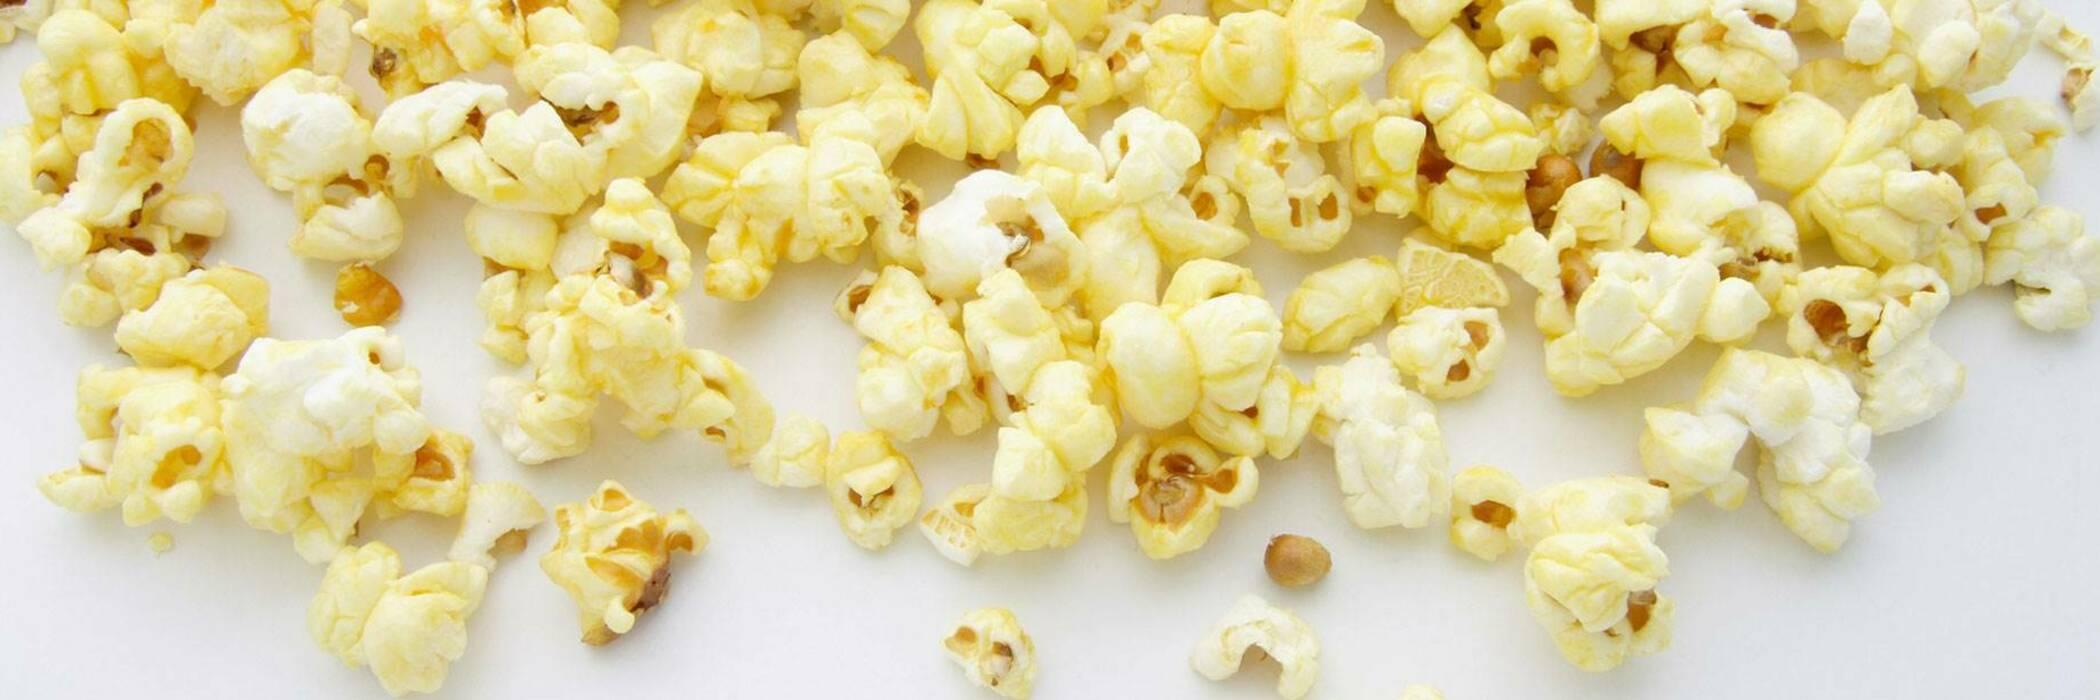 Popcorn hero